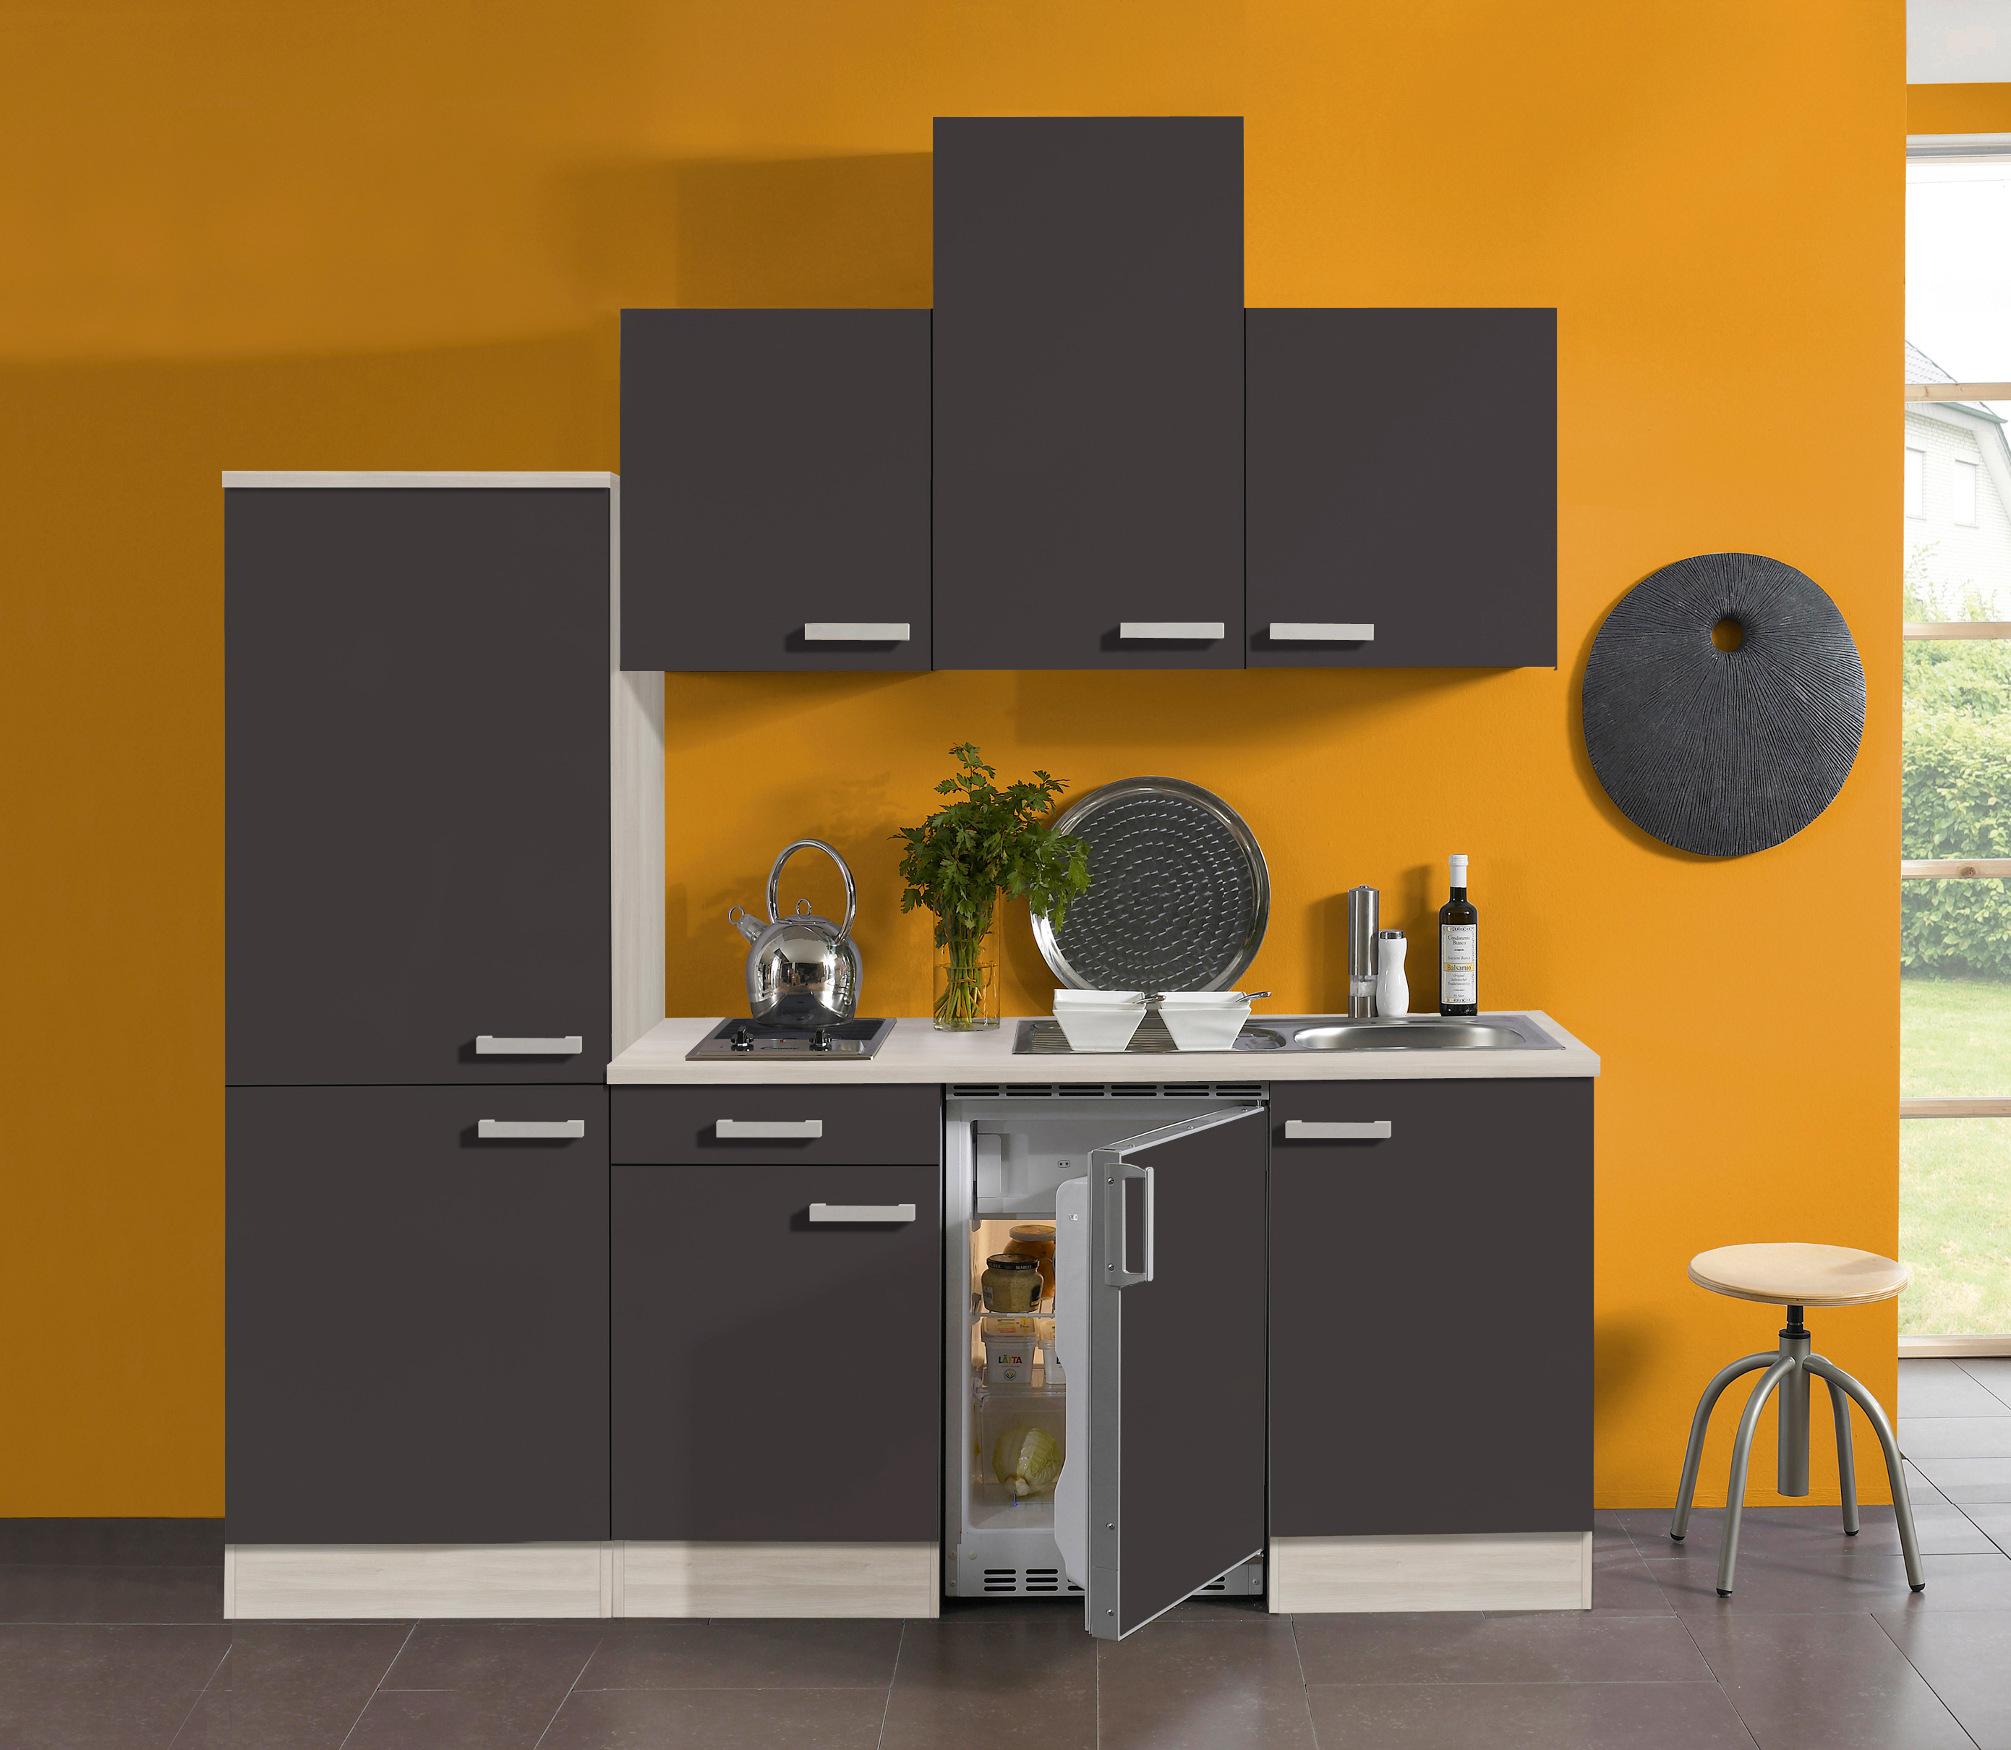 singlek che barcelona vario 2 glaskeramik kochfeld breite 210 cm grau k che singlek chen. Black Bedroom Furniture Sets. Home Design Ideas